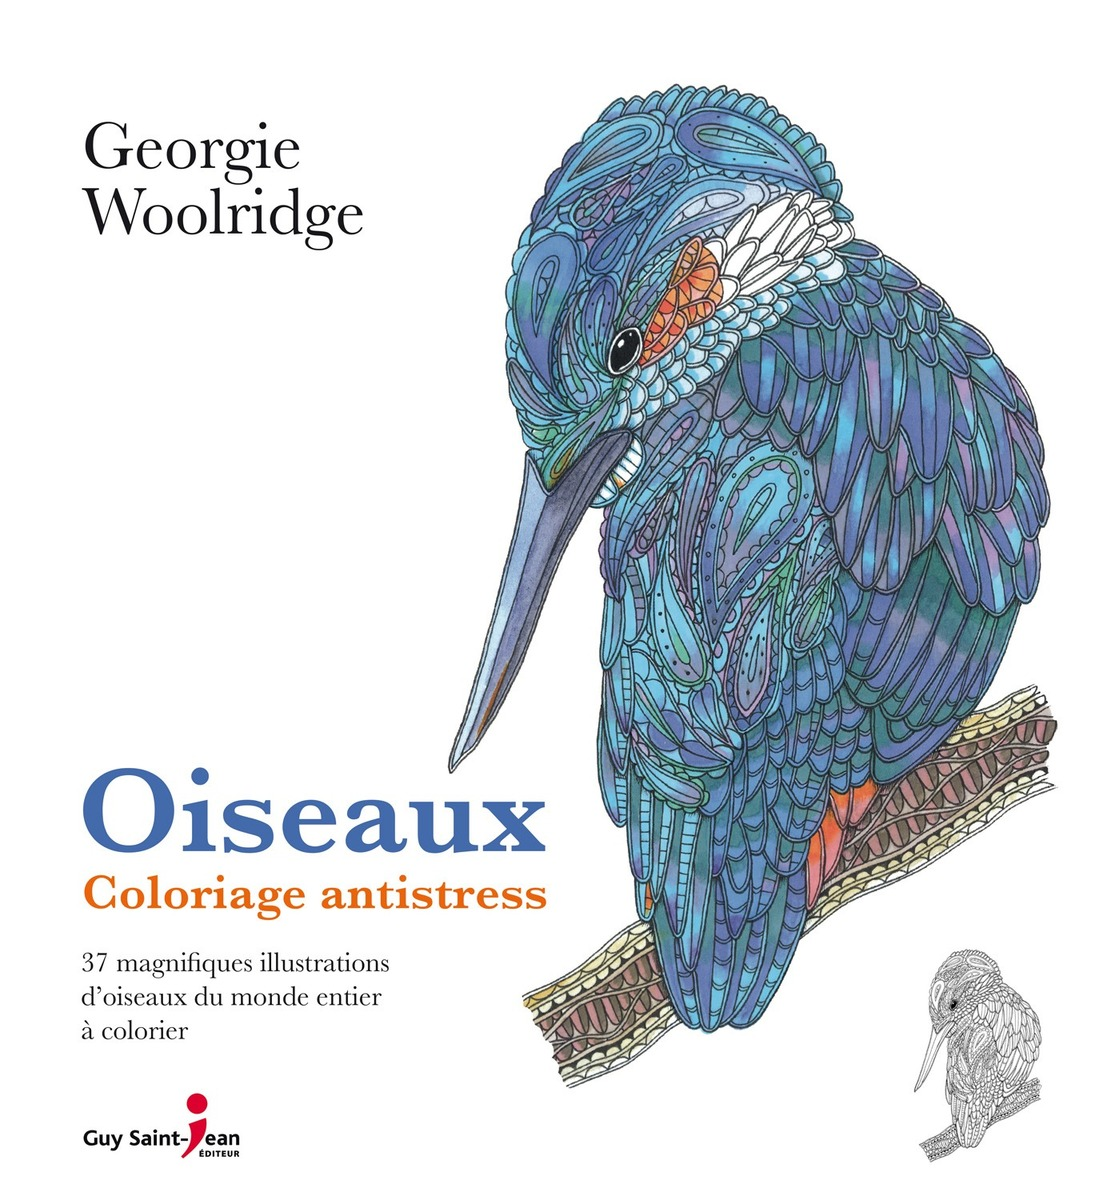 Coloriage Anti Stress Perroquet.Oiseaux Coloriage Antistress Georgie Woolridge Quebec Loisirs